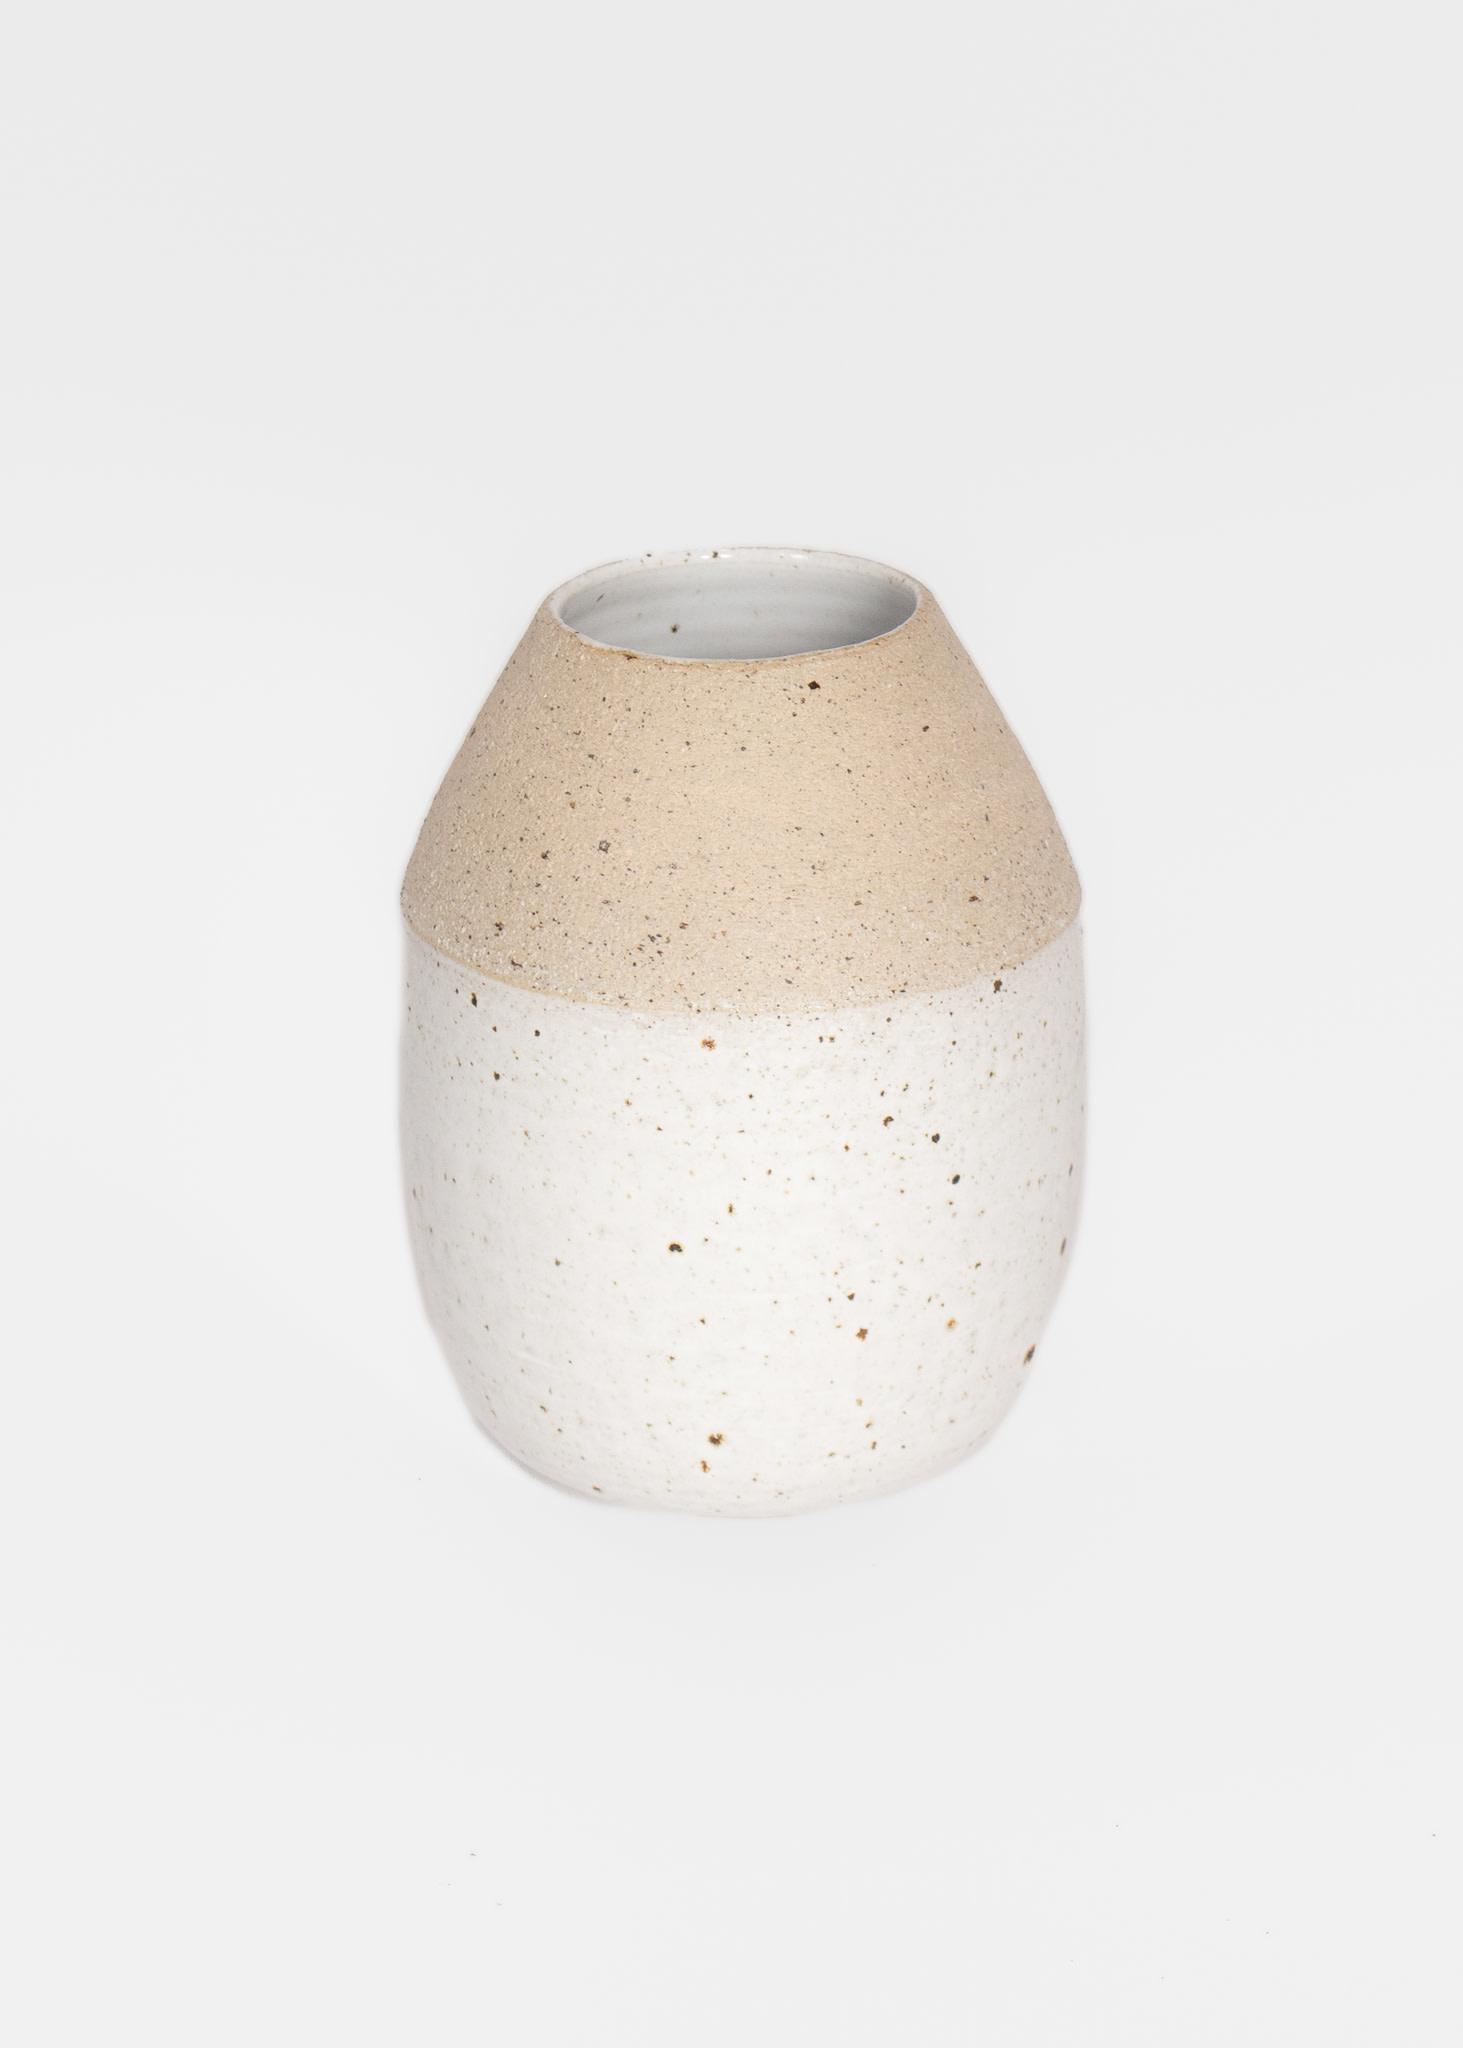 Tasjap Small vase with white bottom